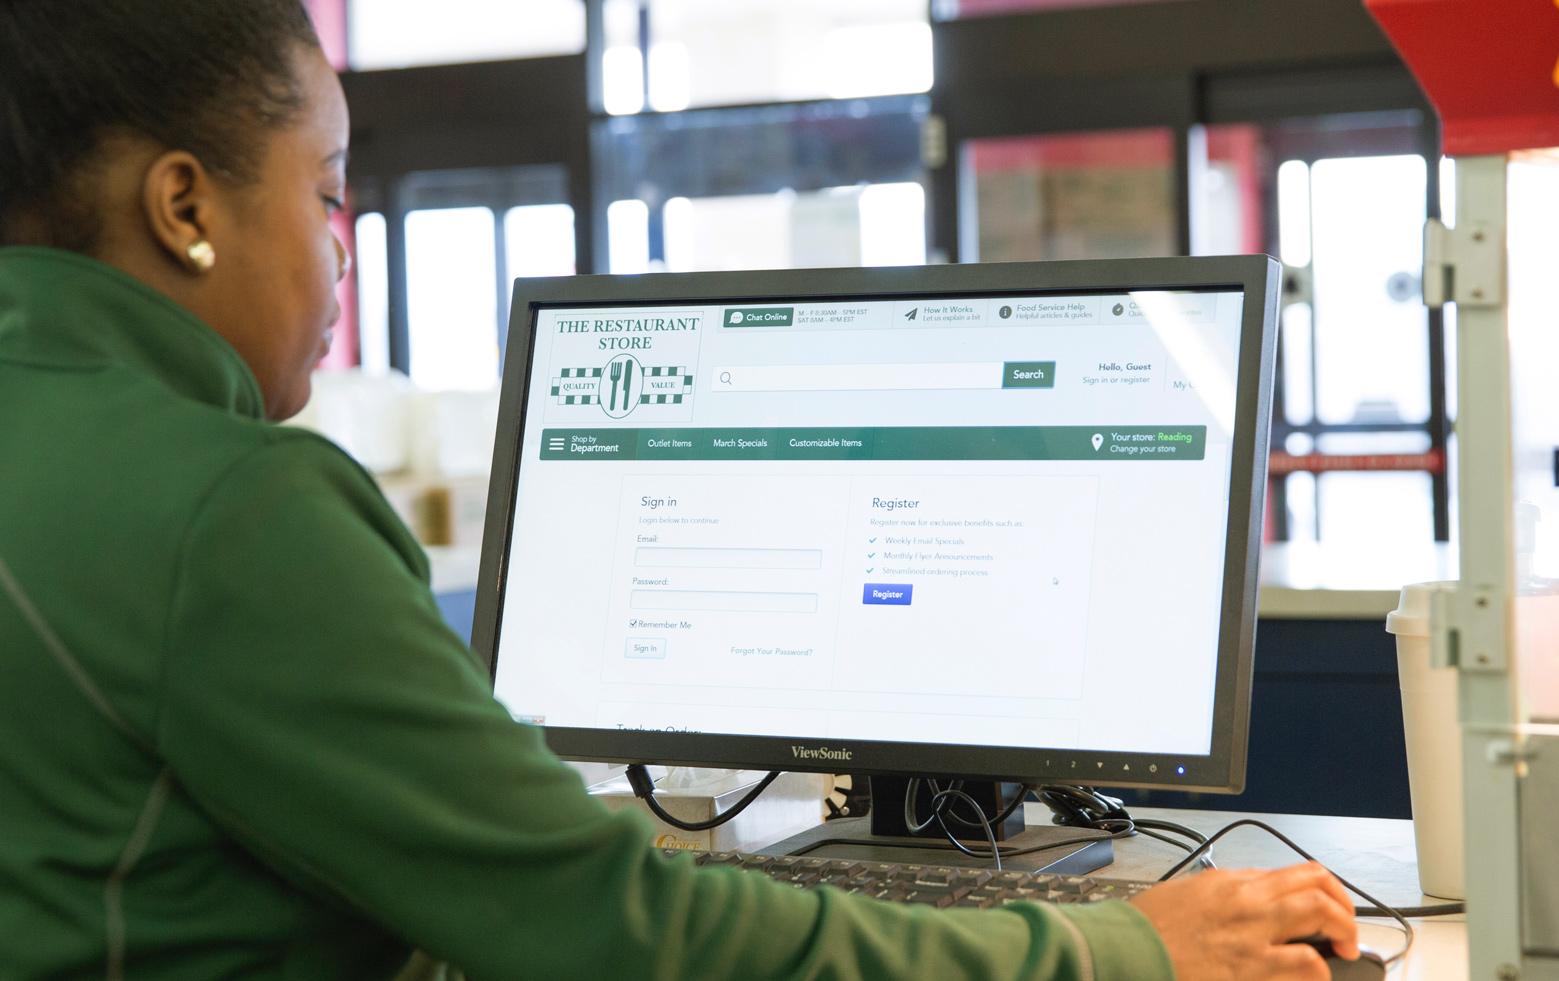 A The RestaurantStore employee on the computer